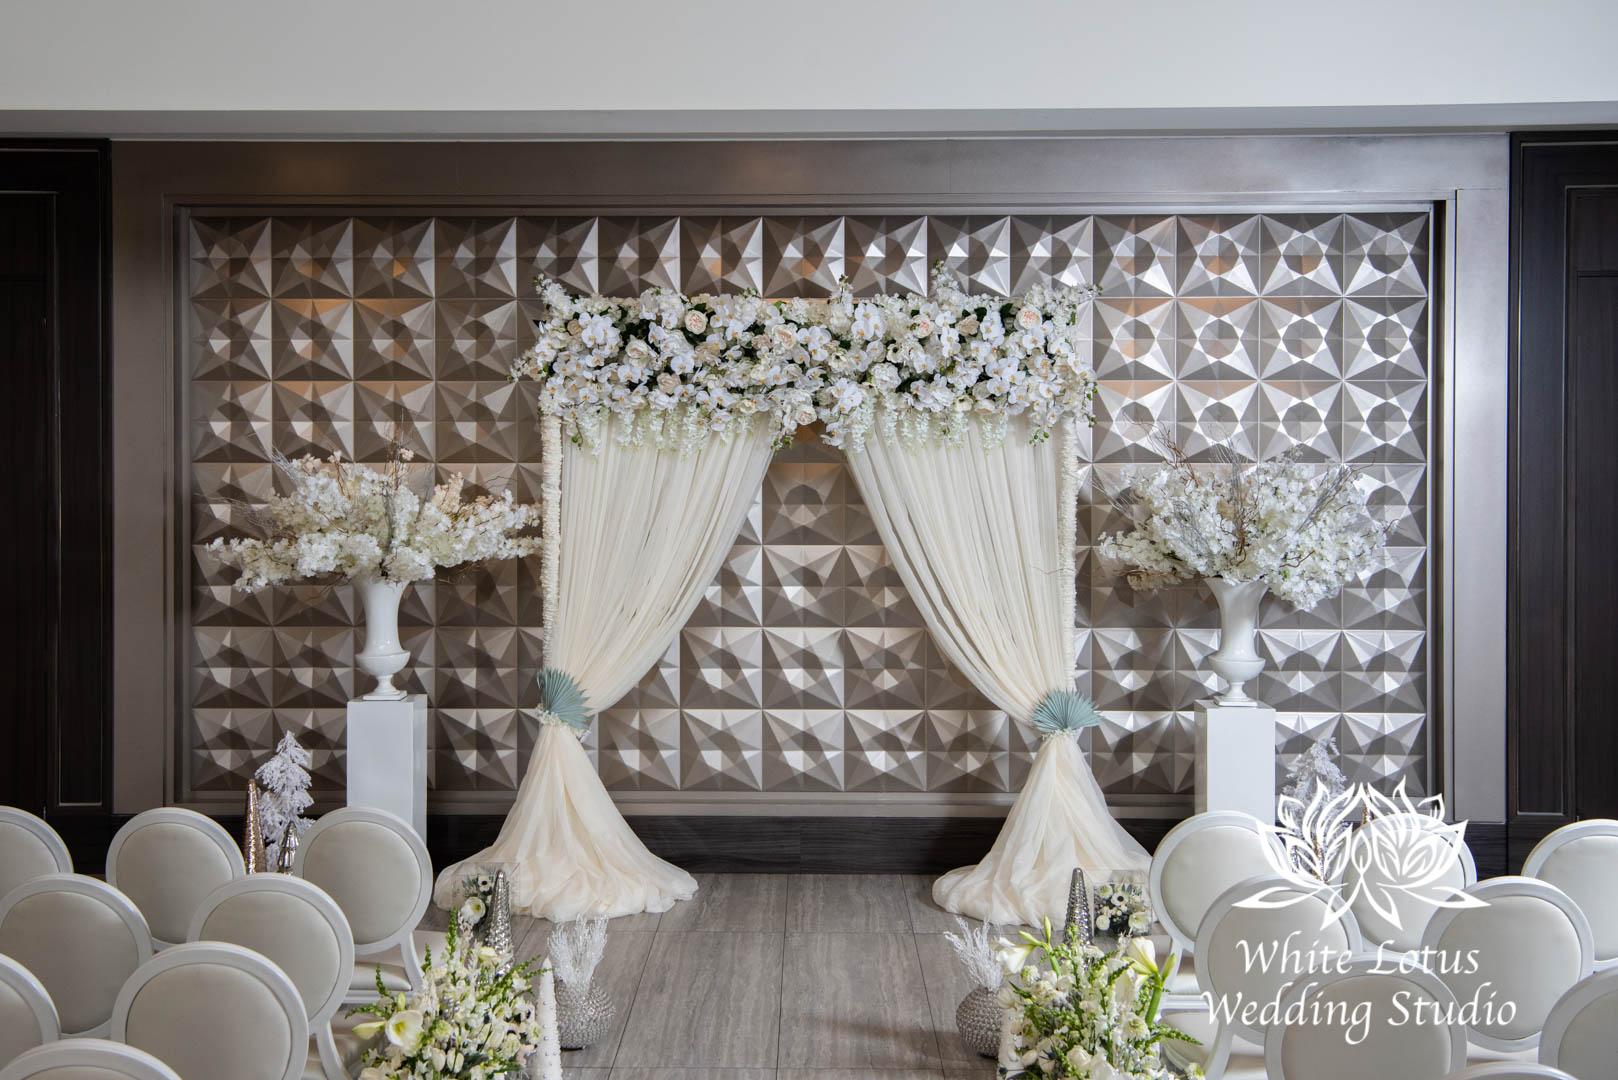 007- GLAM WINTERLUXE WEDDING INSPIRATION